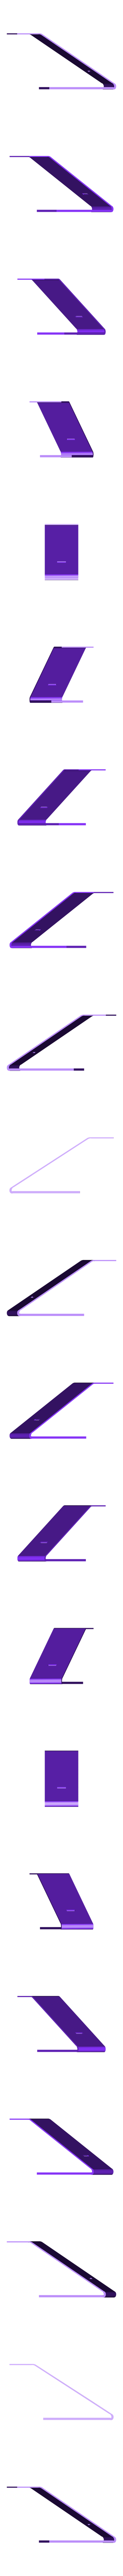 Visualizer.STL Download free STL file PRATI Visualizer • 3D printer design, Cereale-killer